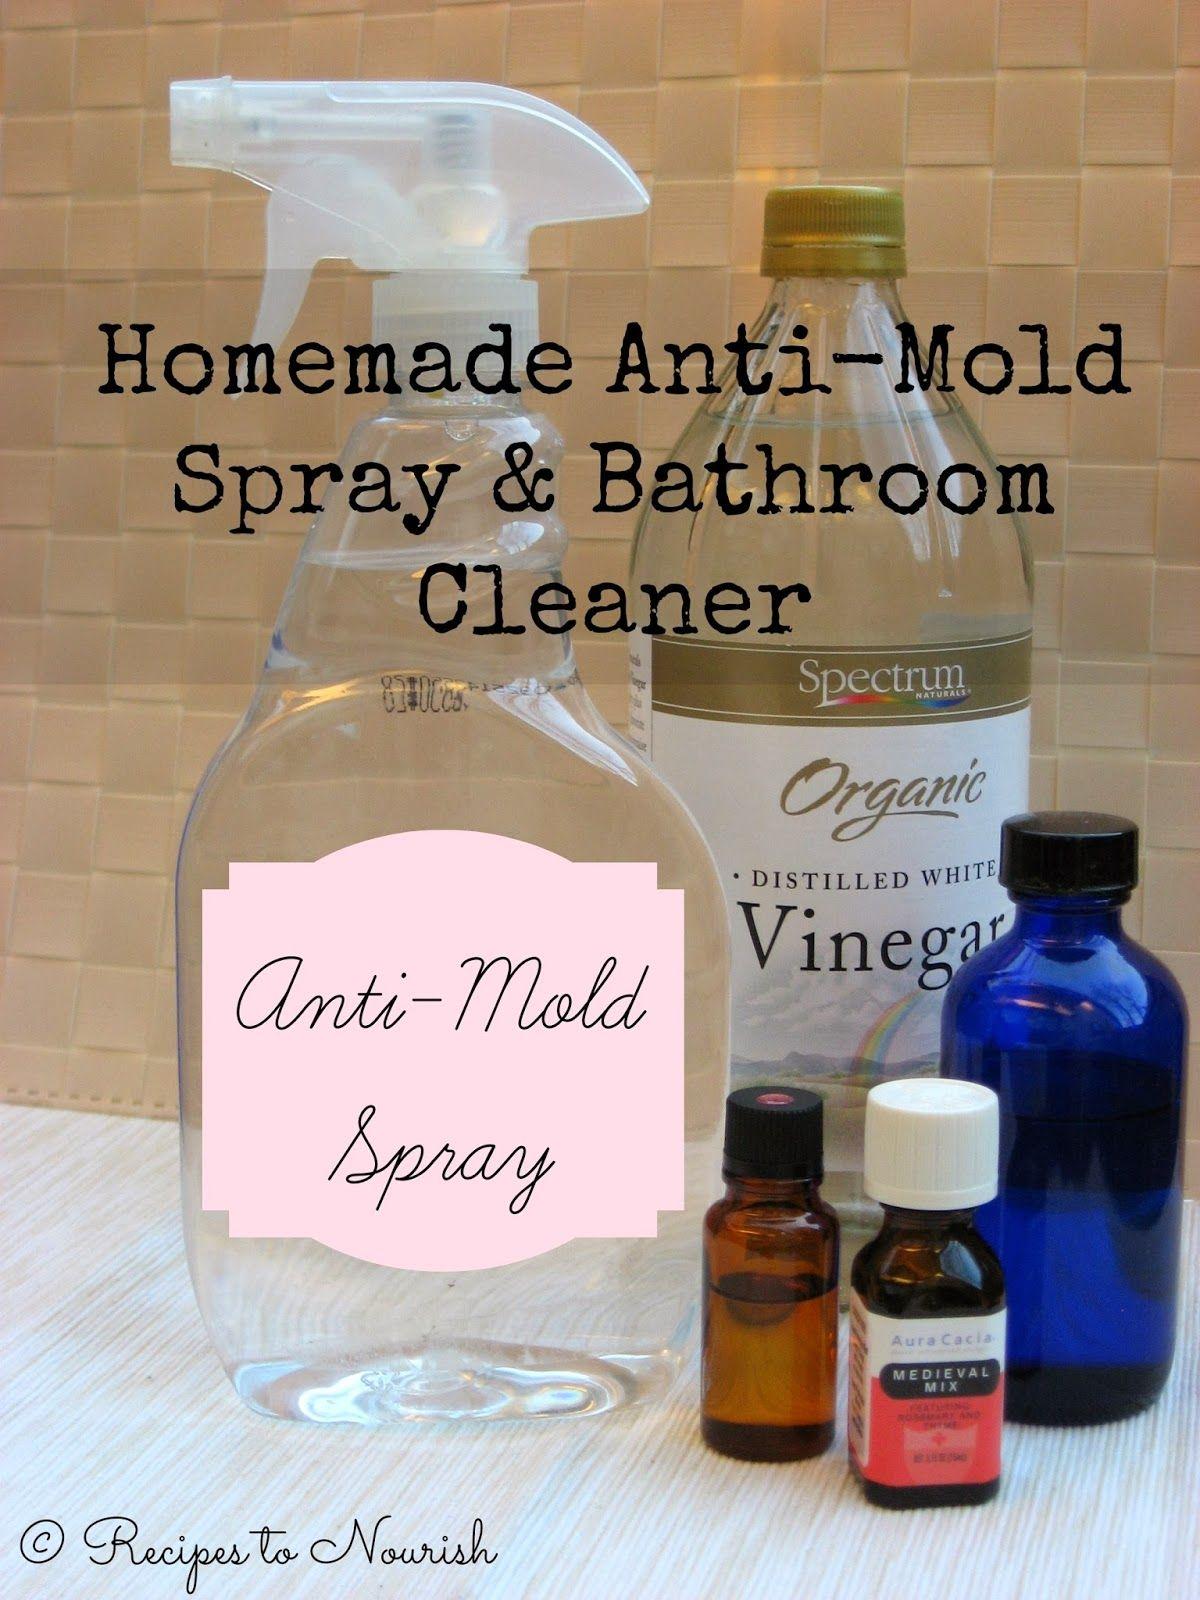 Homemade AntiMold Spray & Bathroom Cleaner Cleaning